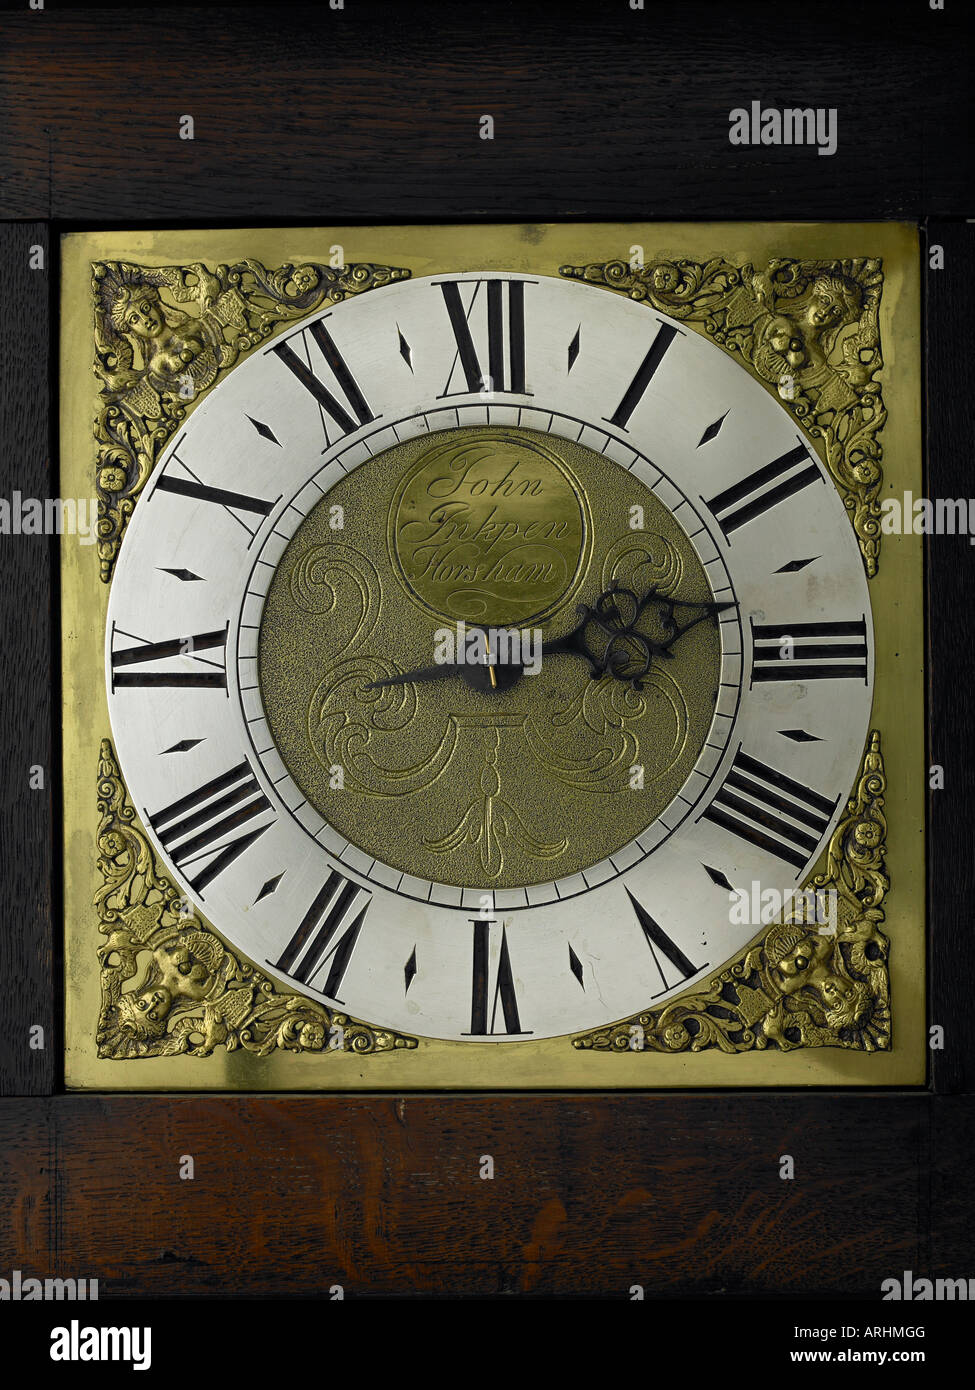 A 30 hour longcase clock by John Inkpen of Horsham circa 1740 - Stock Image